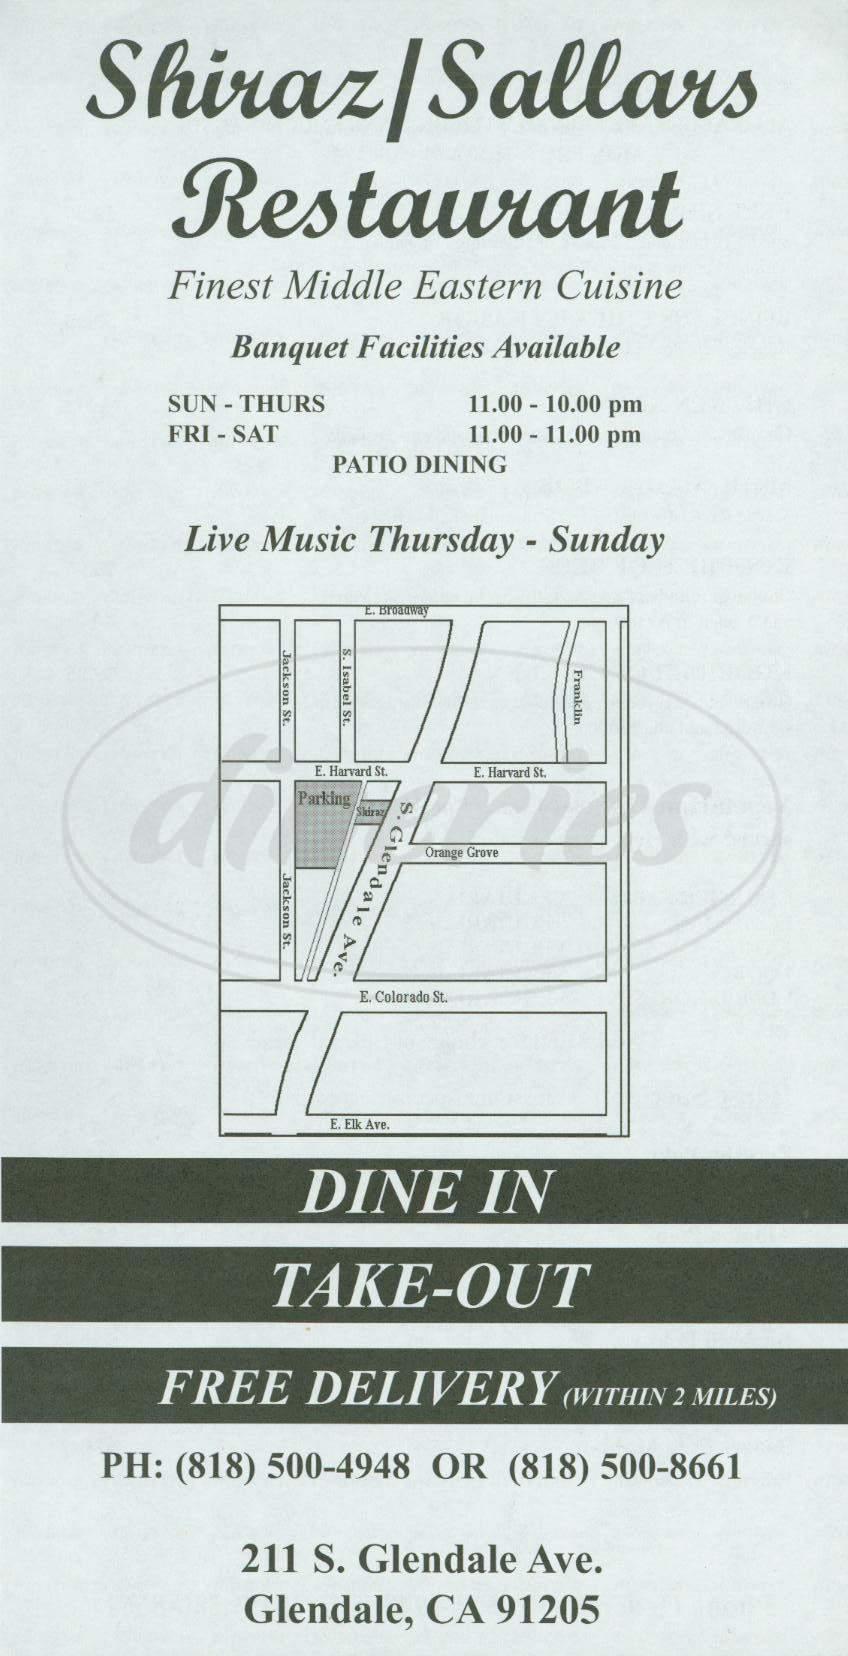 menu for Shiraz Sallars Restaurant